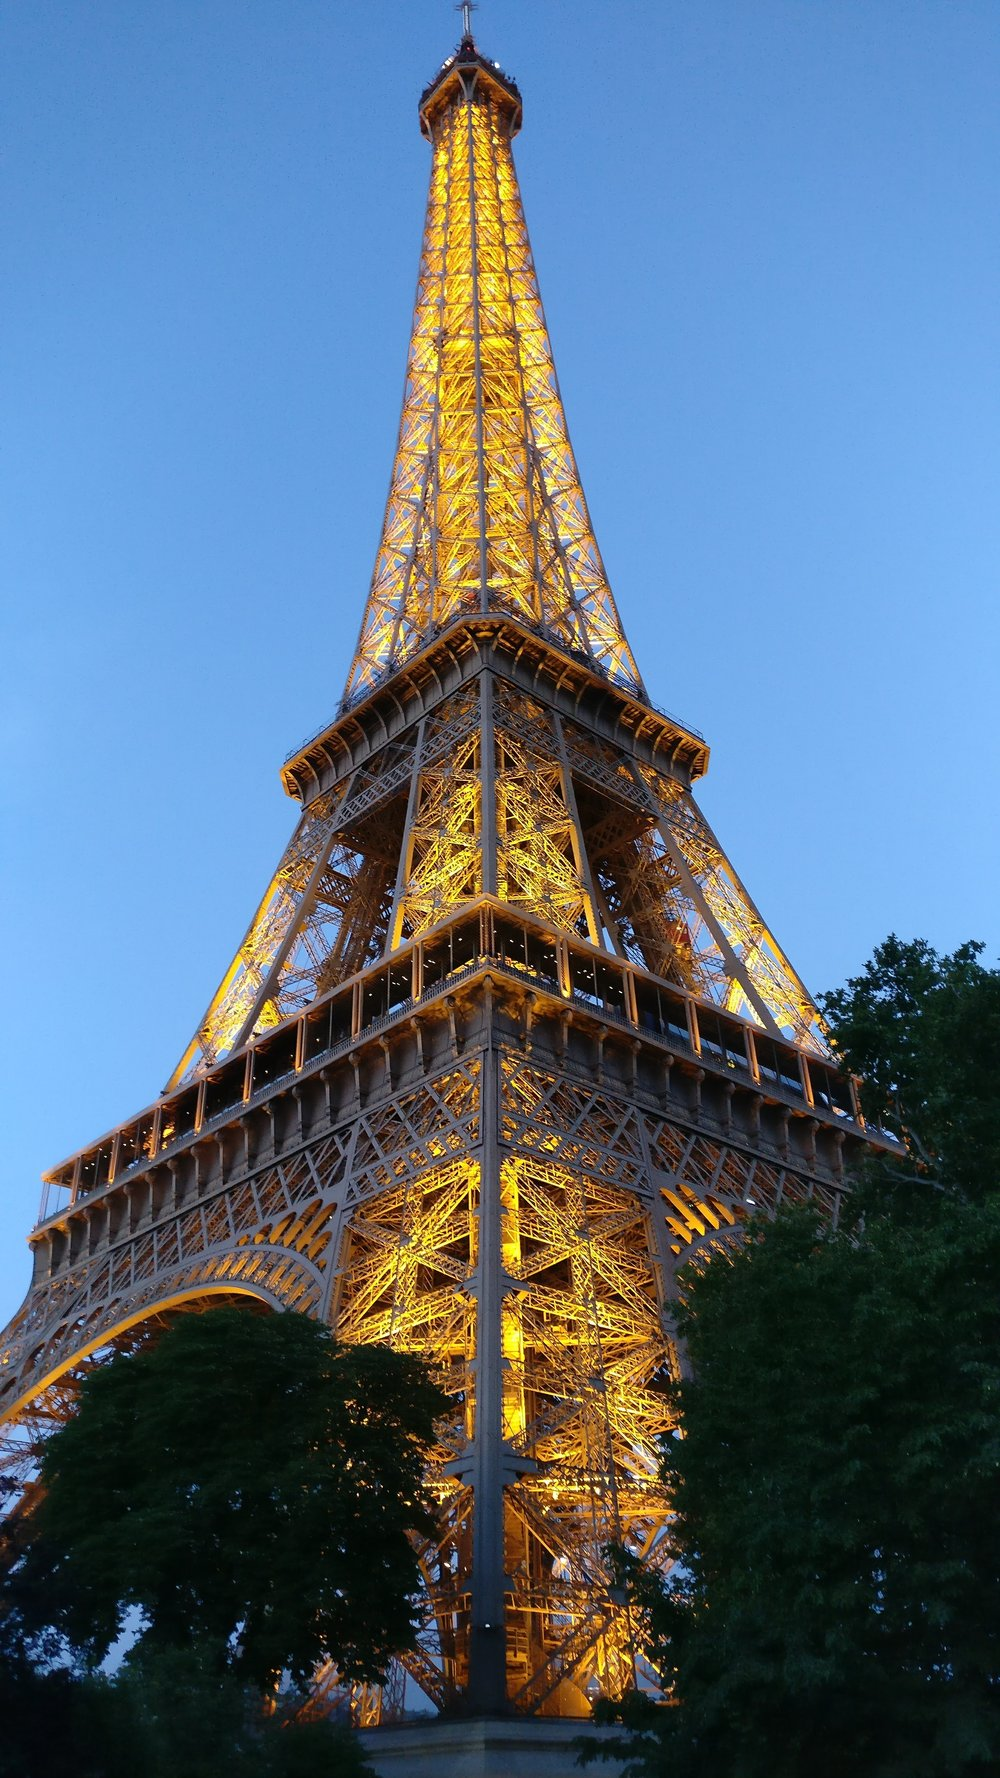 - couples cook: WE'LL ALWAYS HAVE PARIS